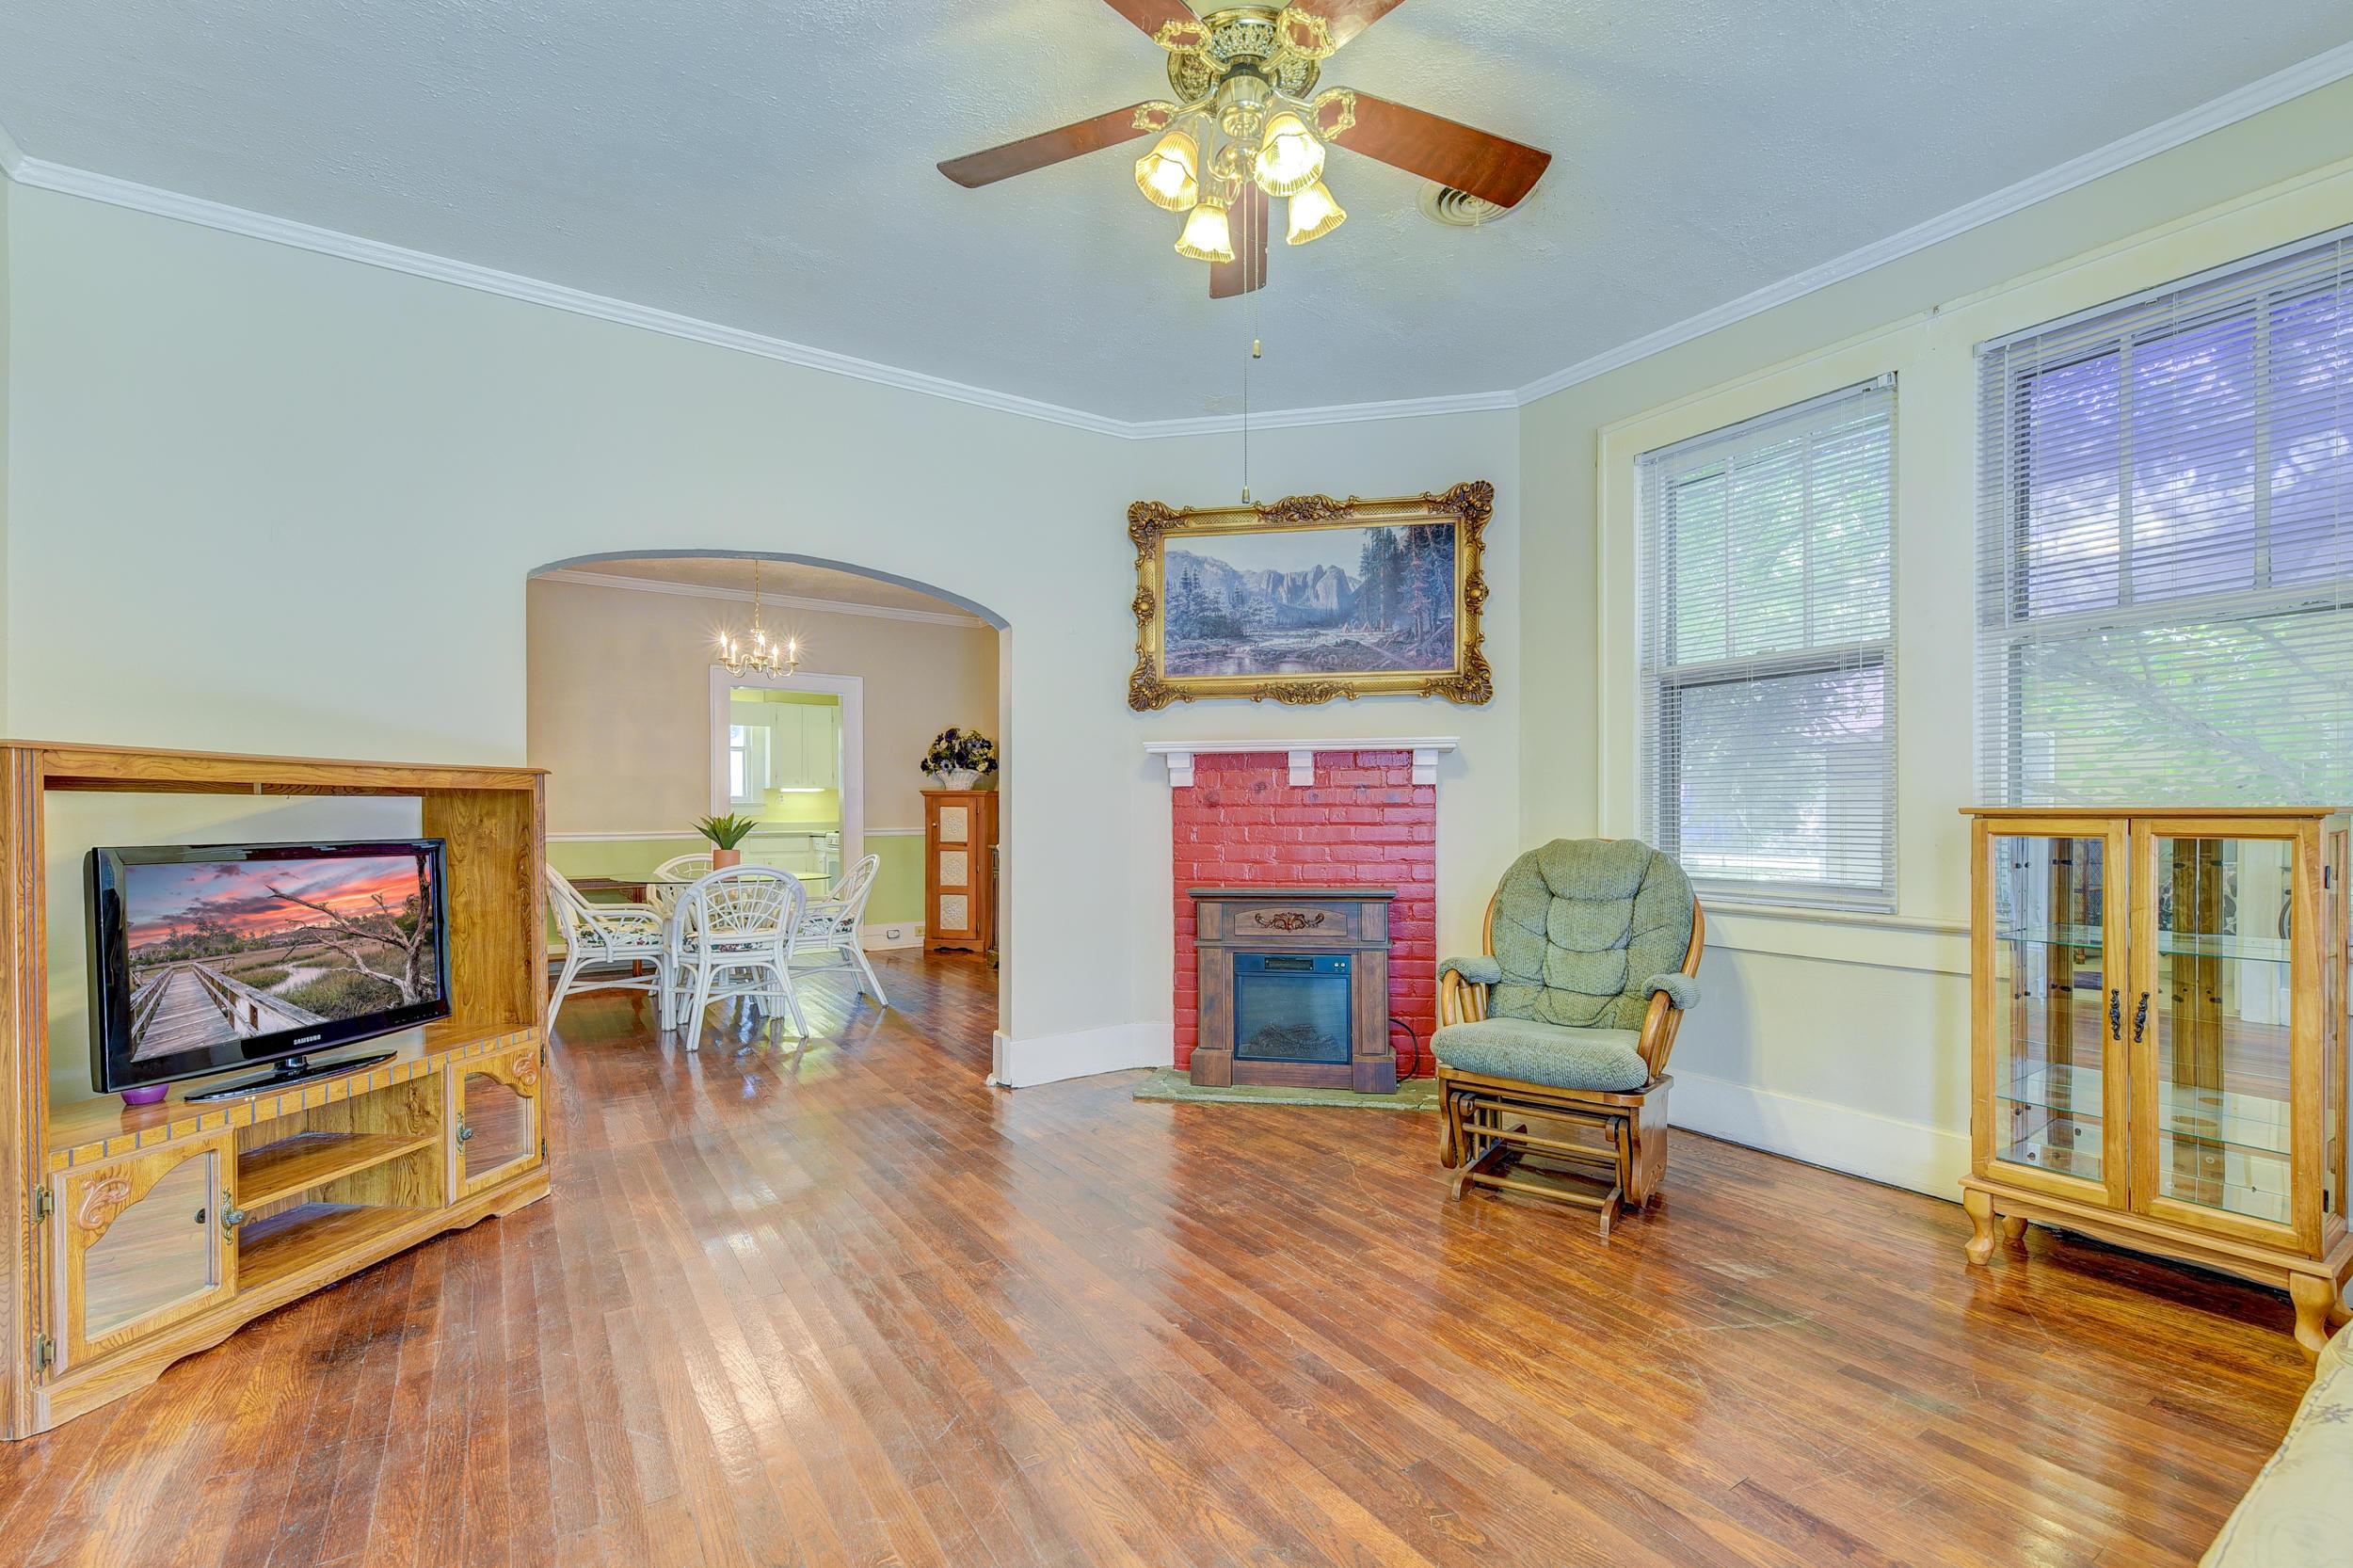 St Andrews Homes For Sale - 1908 2nd, Charleston, SC - 31